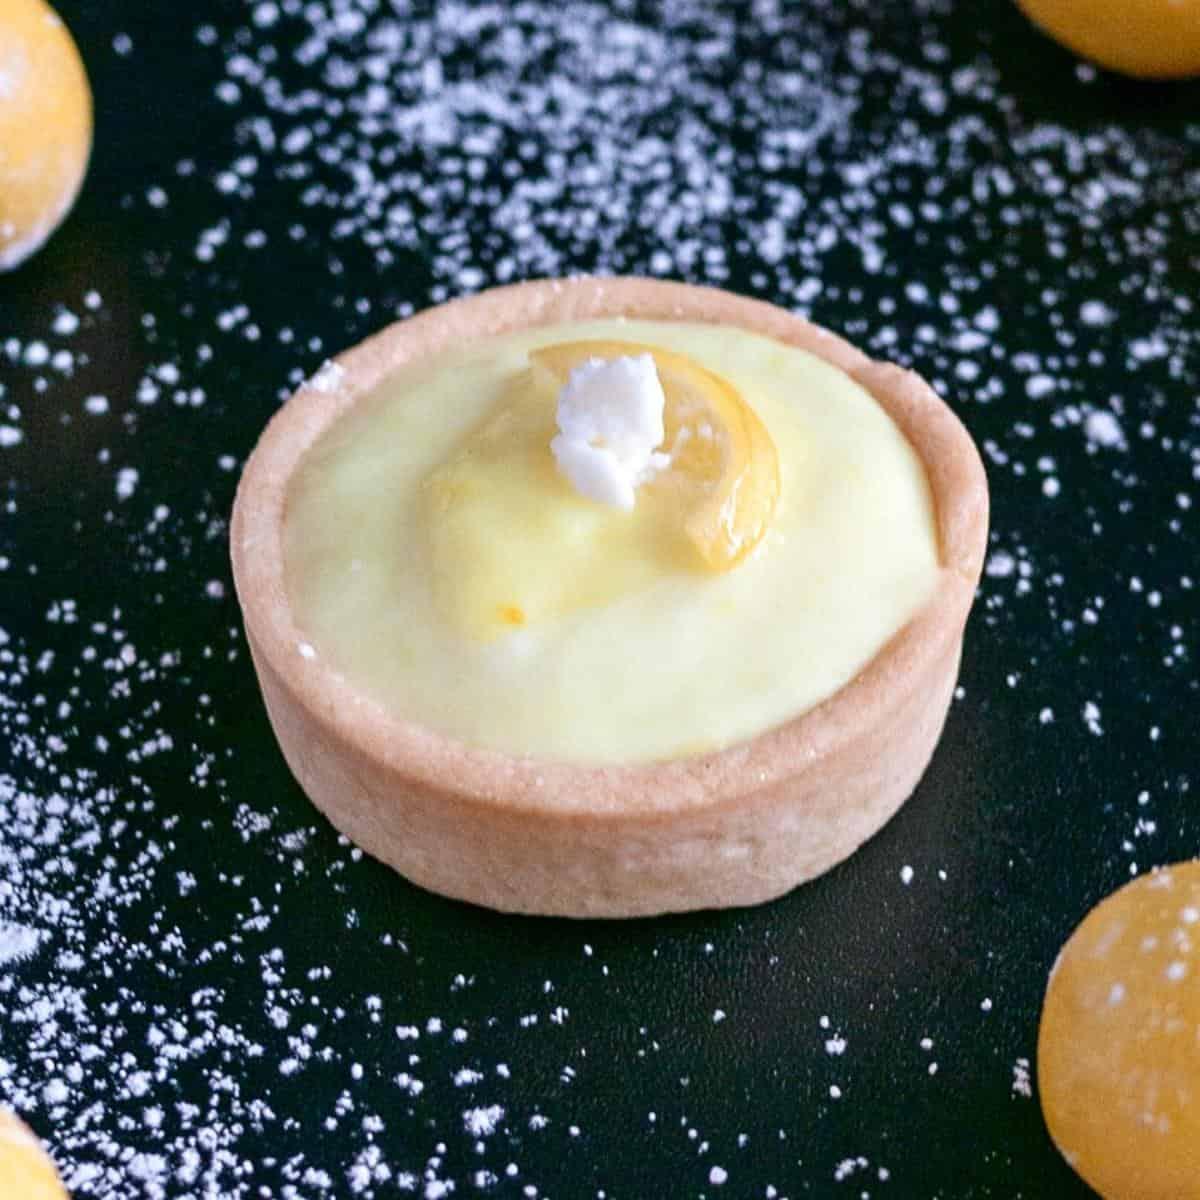 Mini tart filling with lemon cheesecake filling.